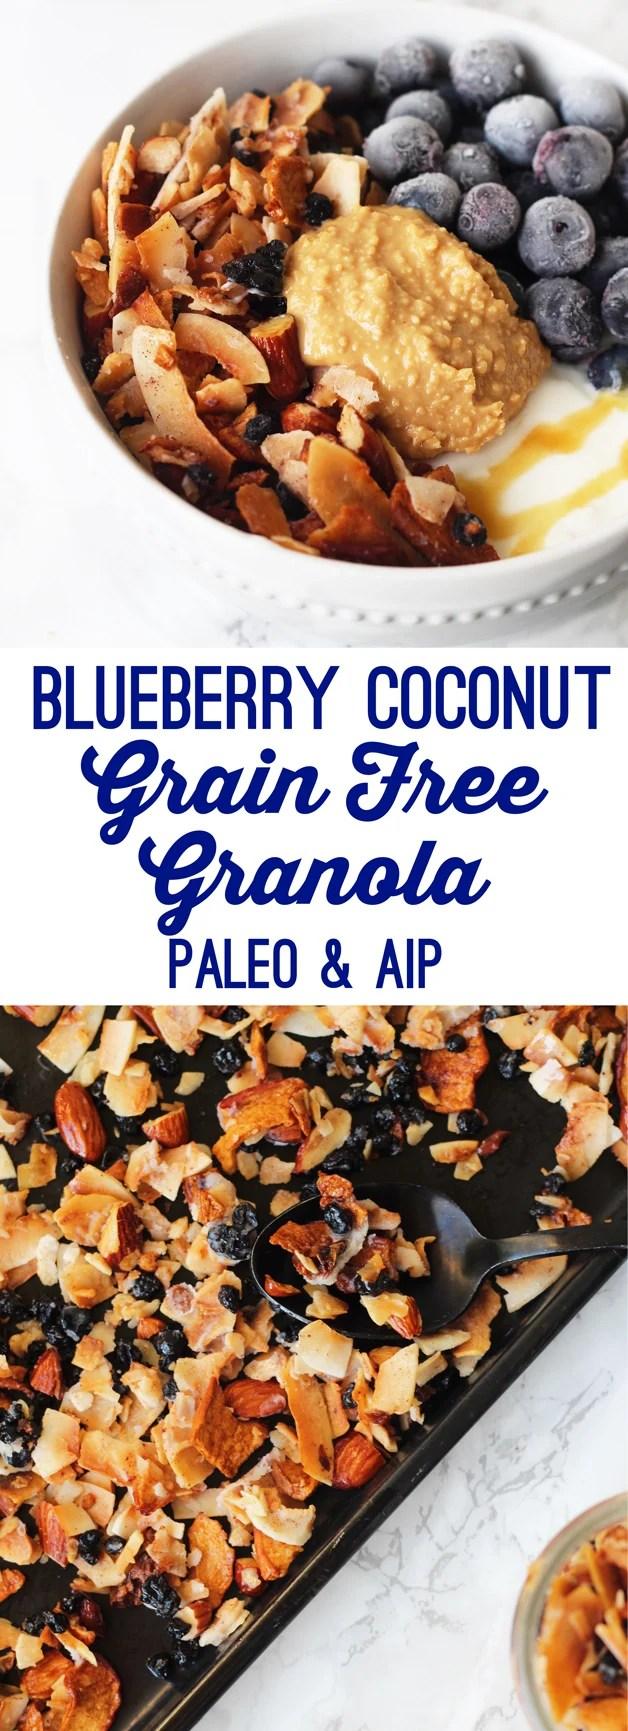 Grain Free Blueberry Coconut Granola (Paleo & AIP)